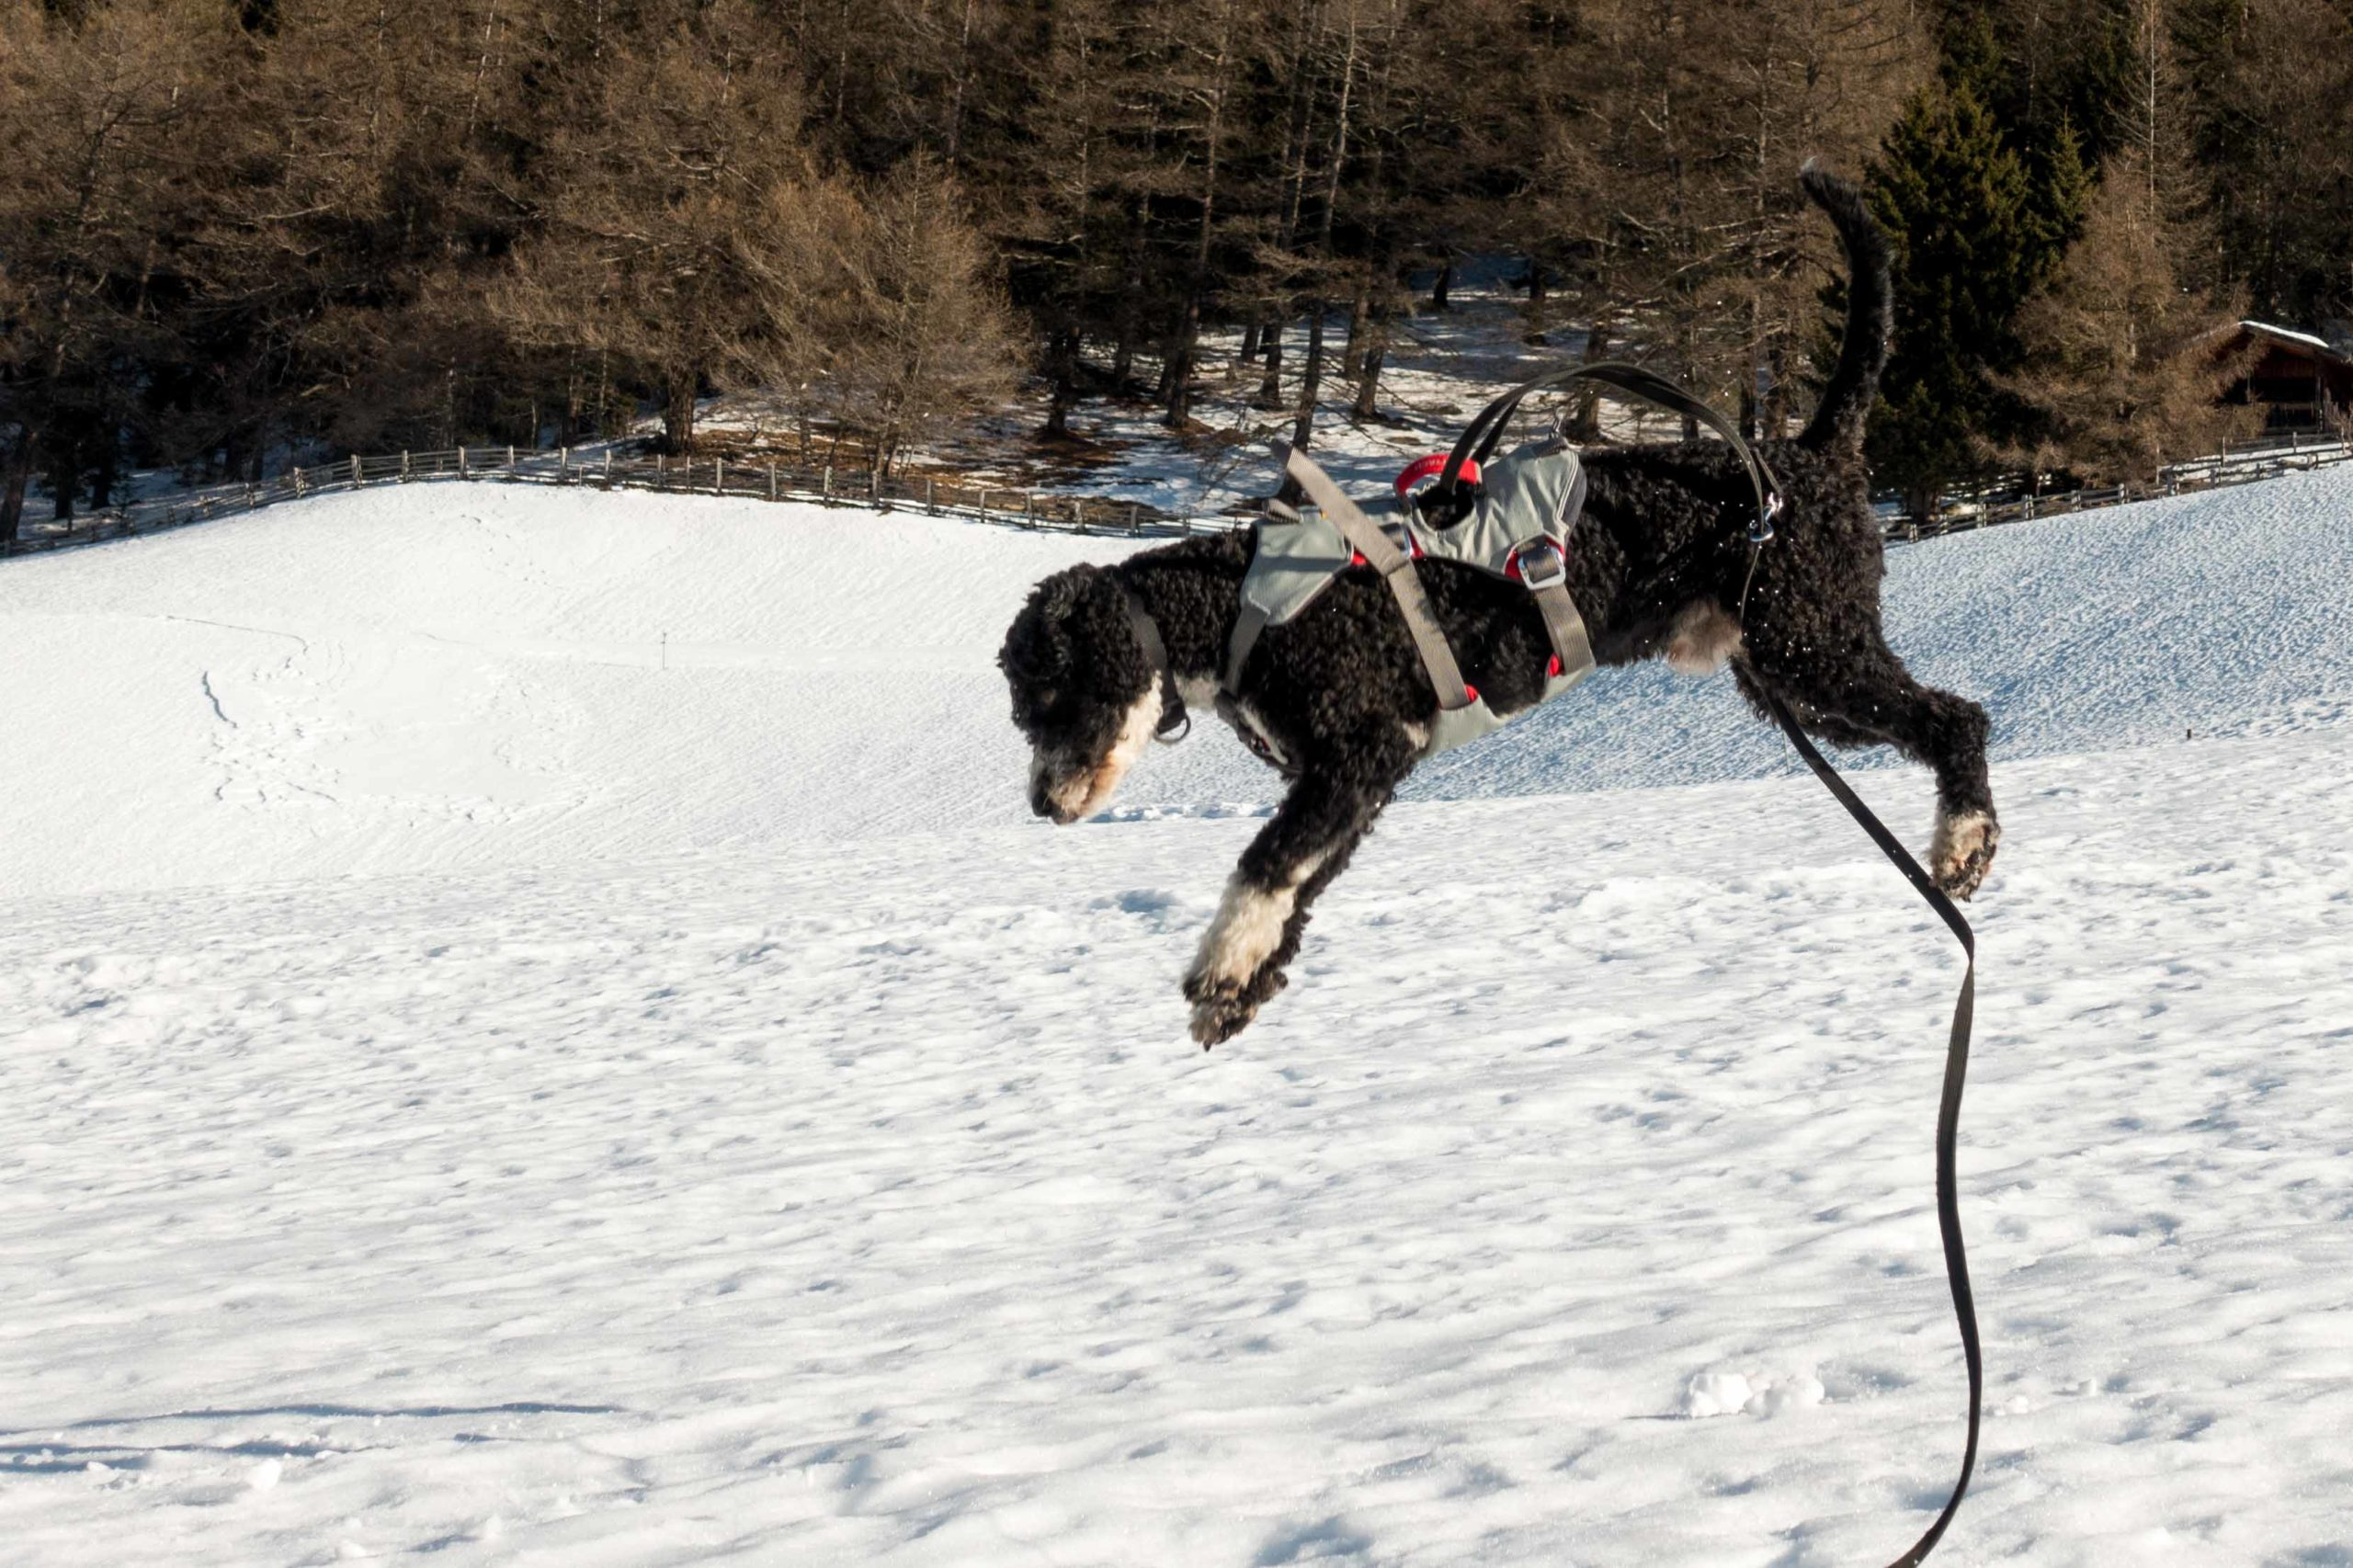 La Pasión Turka Indiana Jones (Indi) unterwegs im Schnee